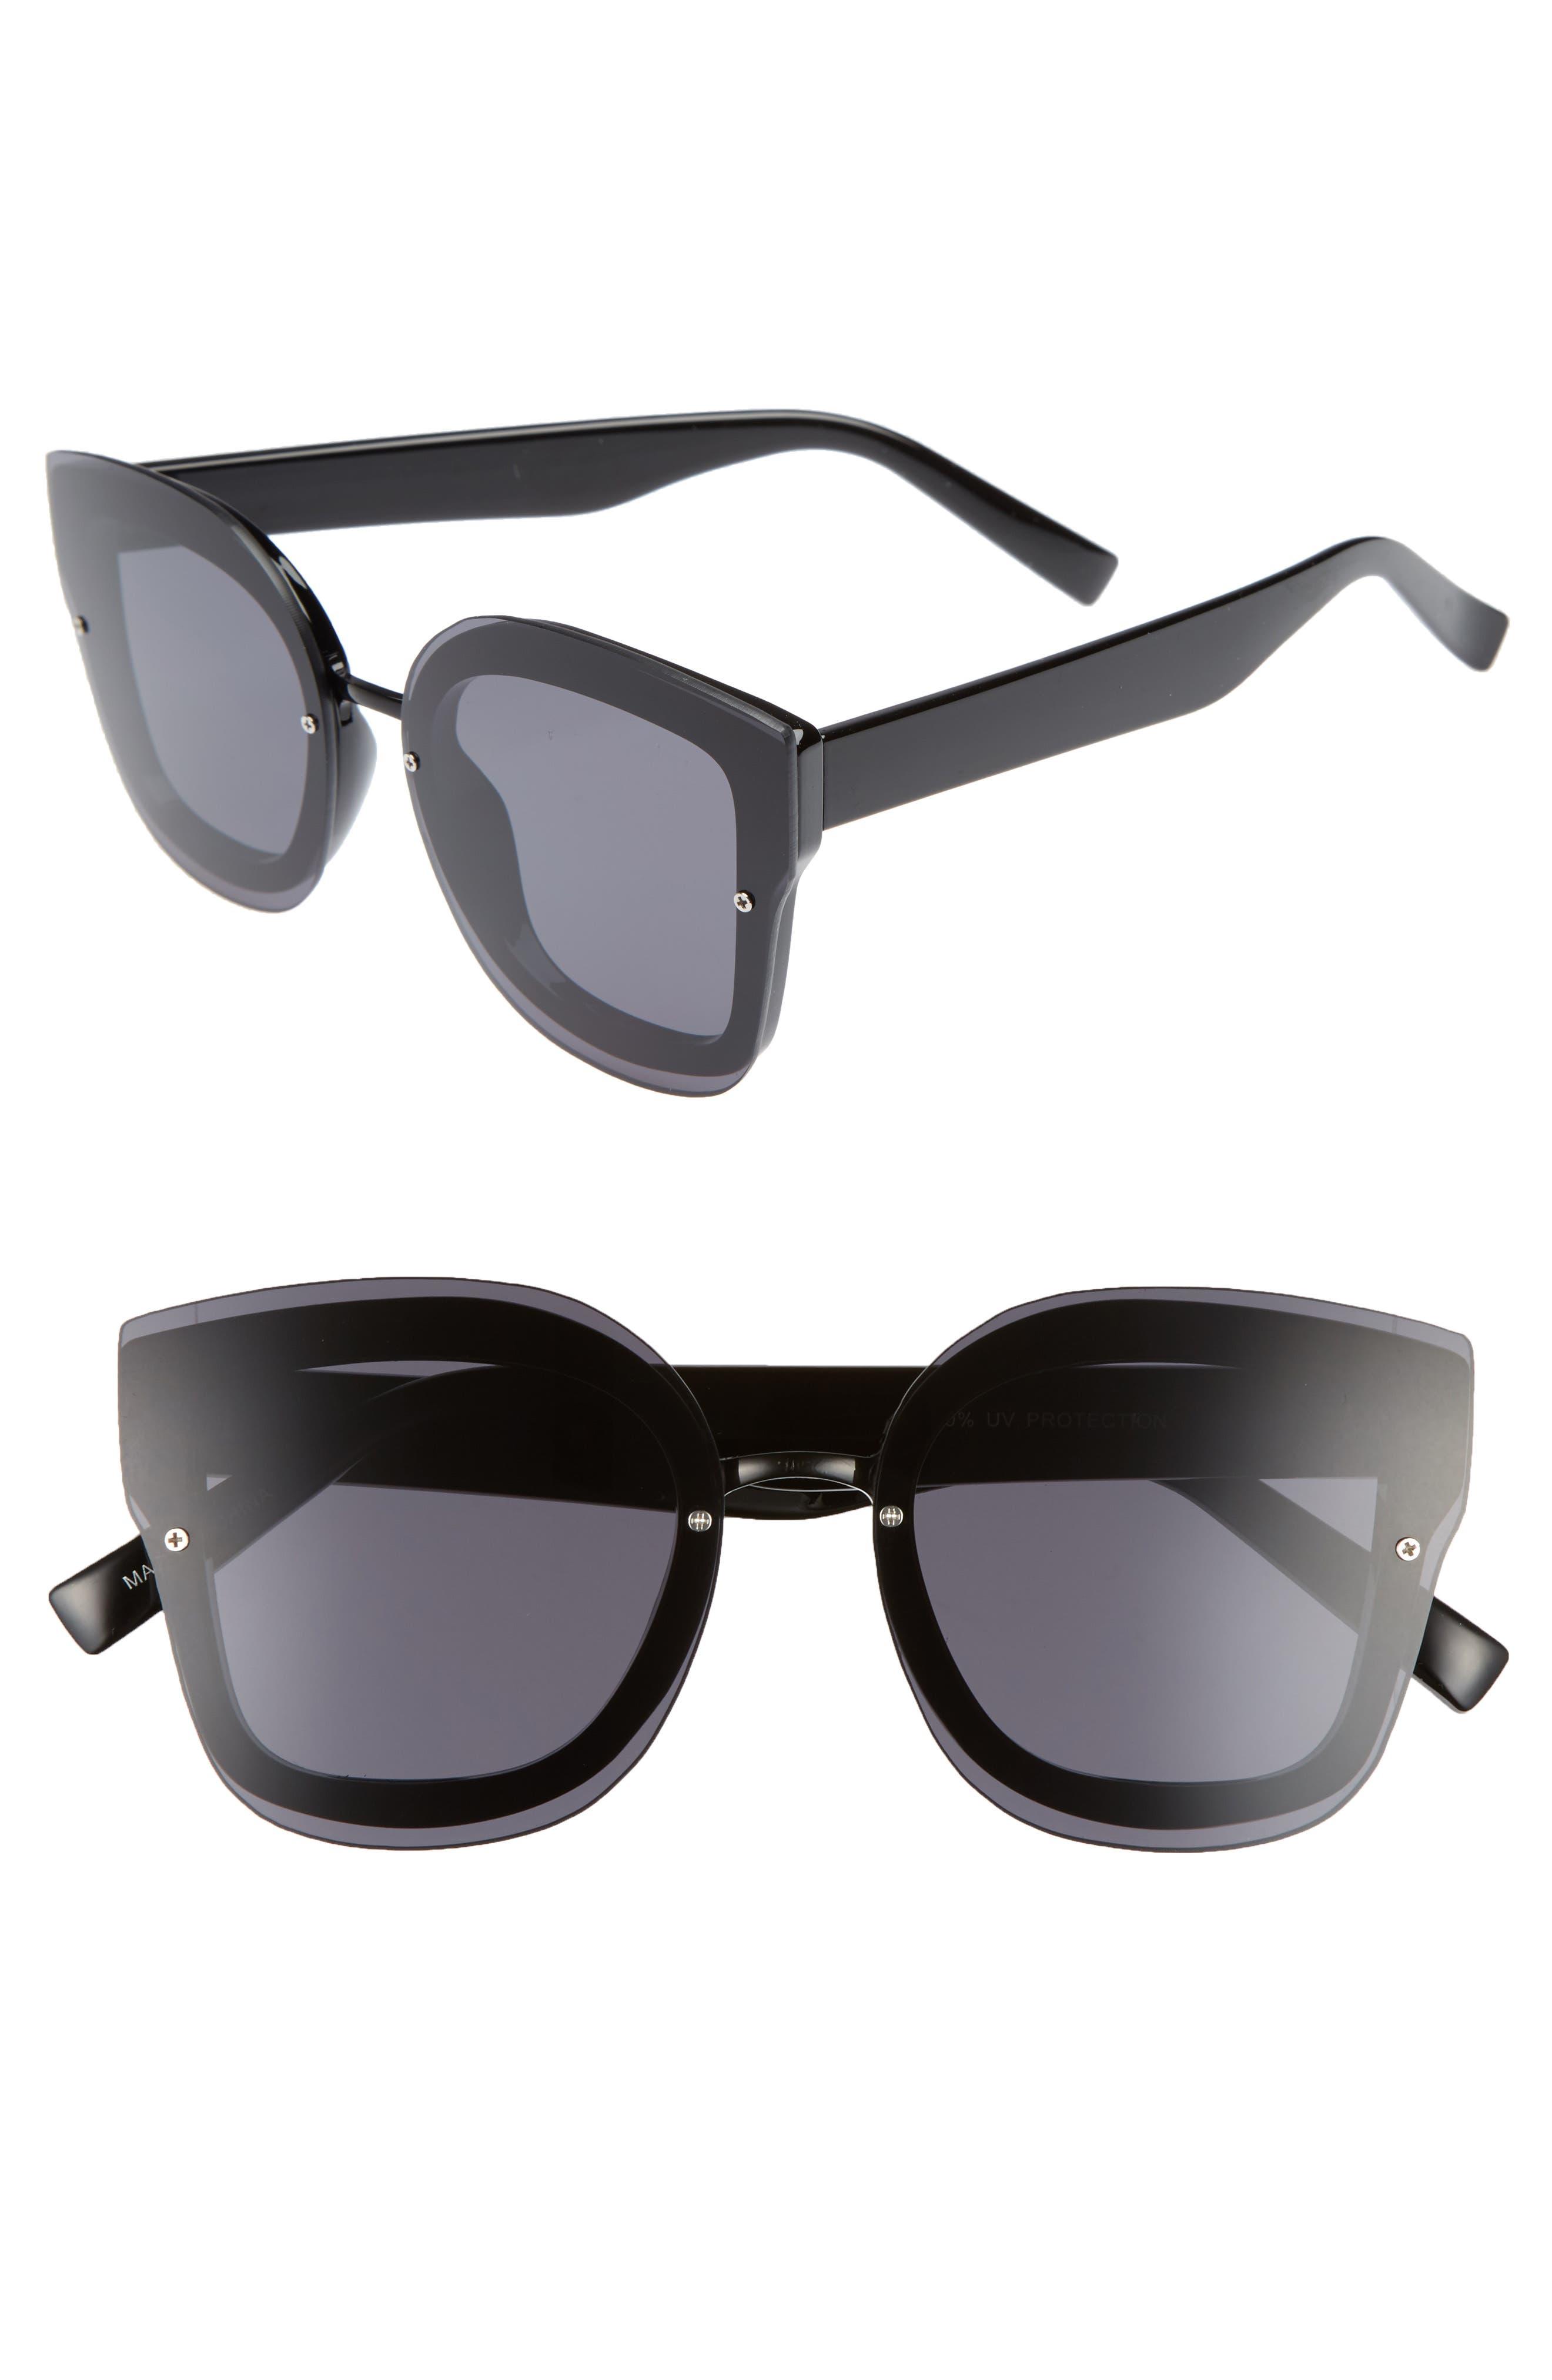 50mm Squared-Off Sunglasses,                             Main thumbnail 1, color,                             001